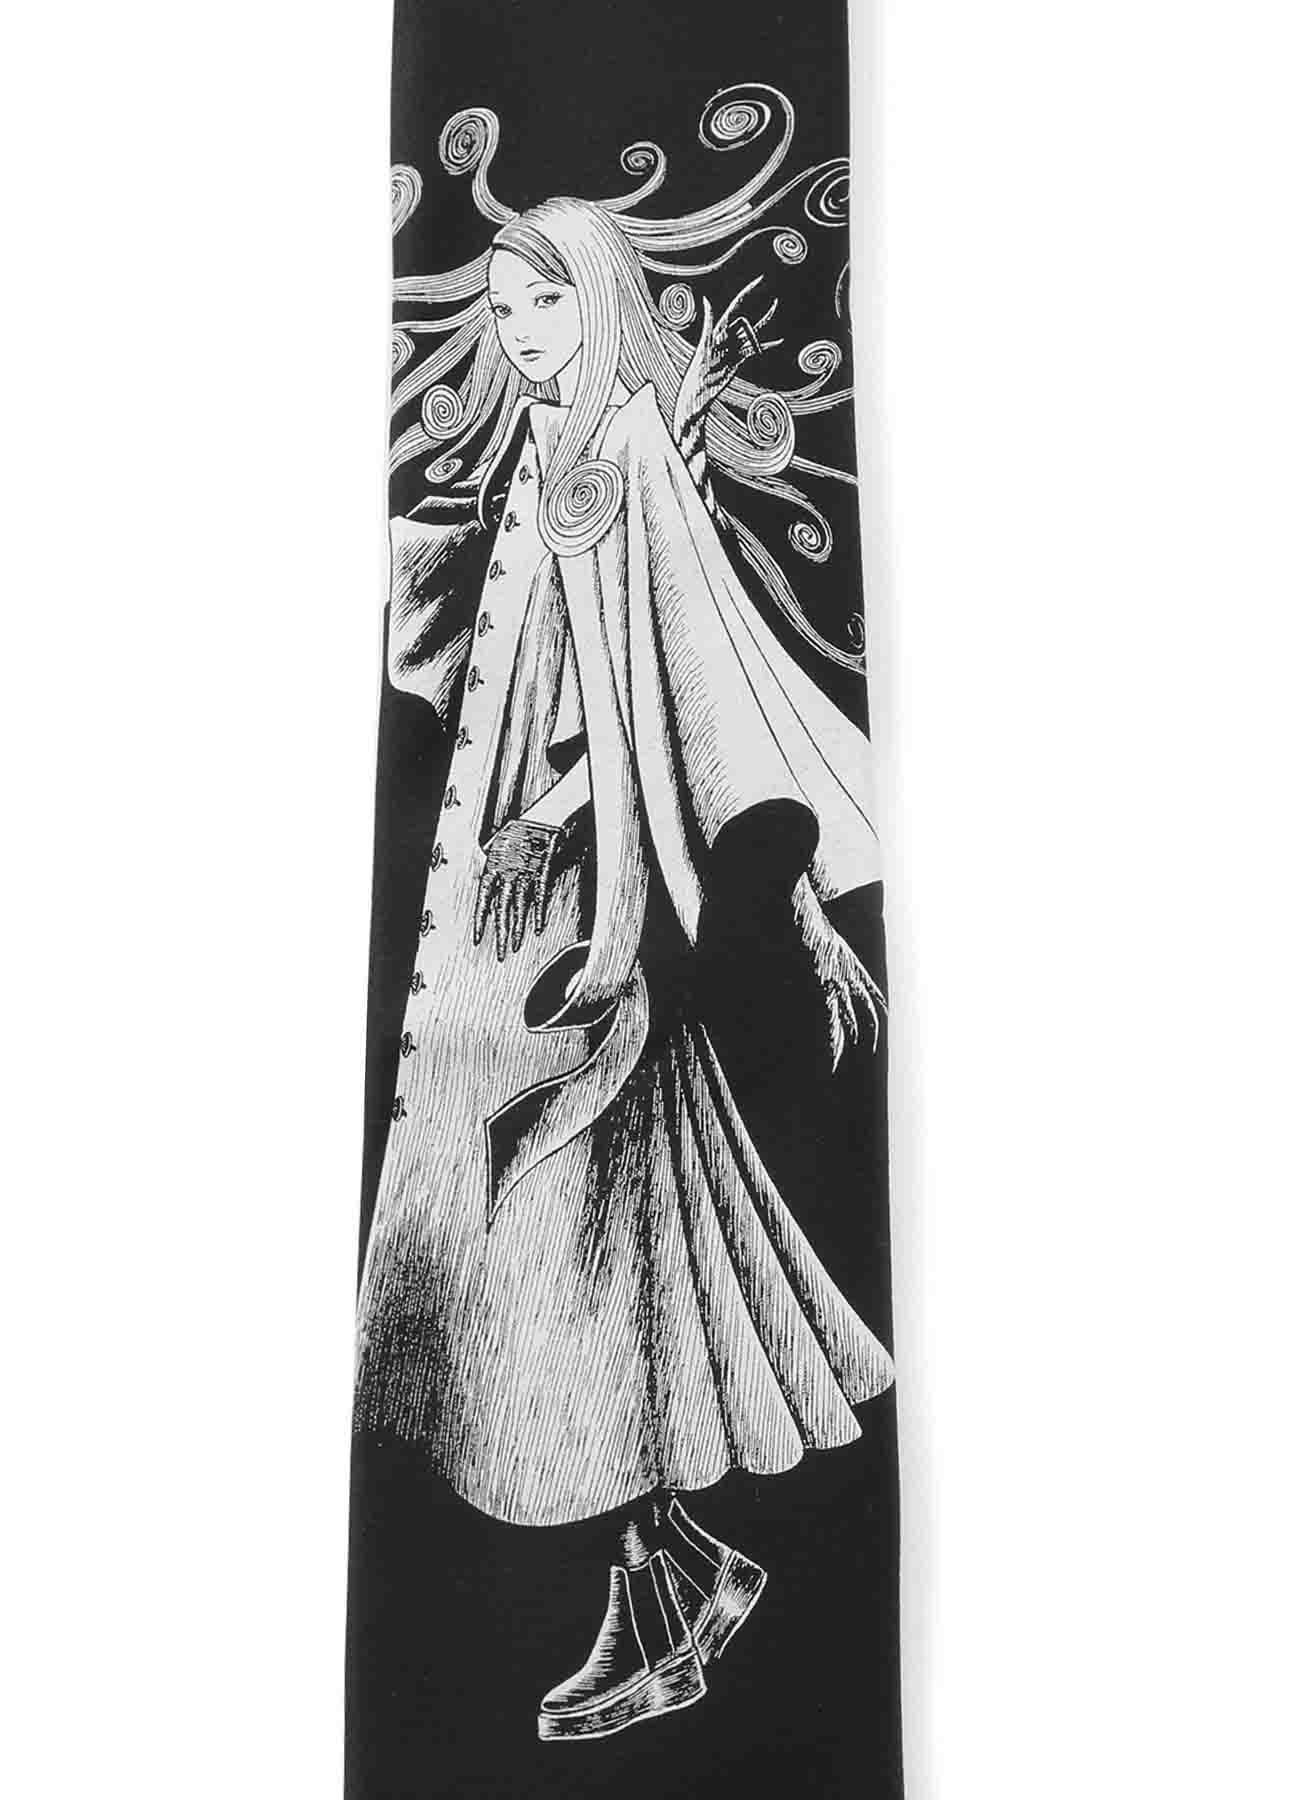 S'YTE × 伊藤润二-五岛桐绘 in YOHJI YAMAMOTO 真丝领带